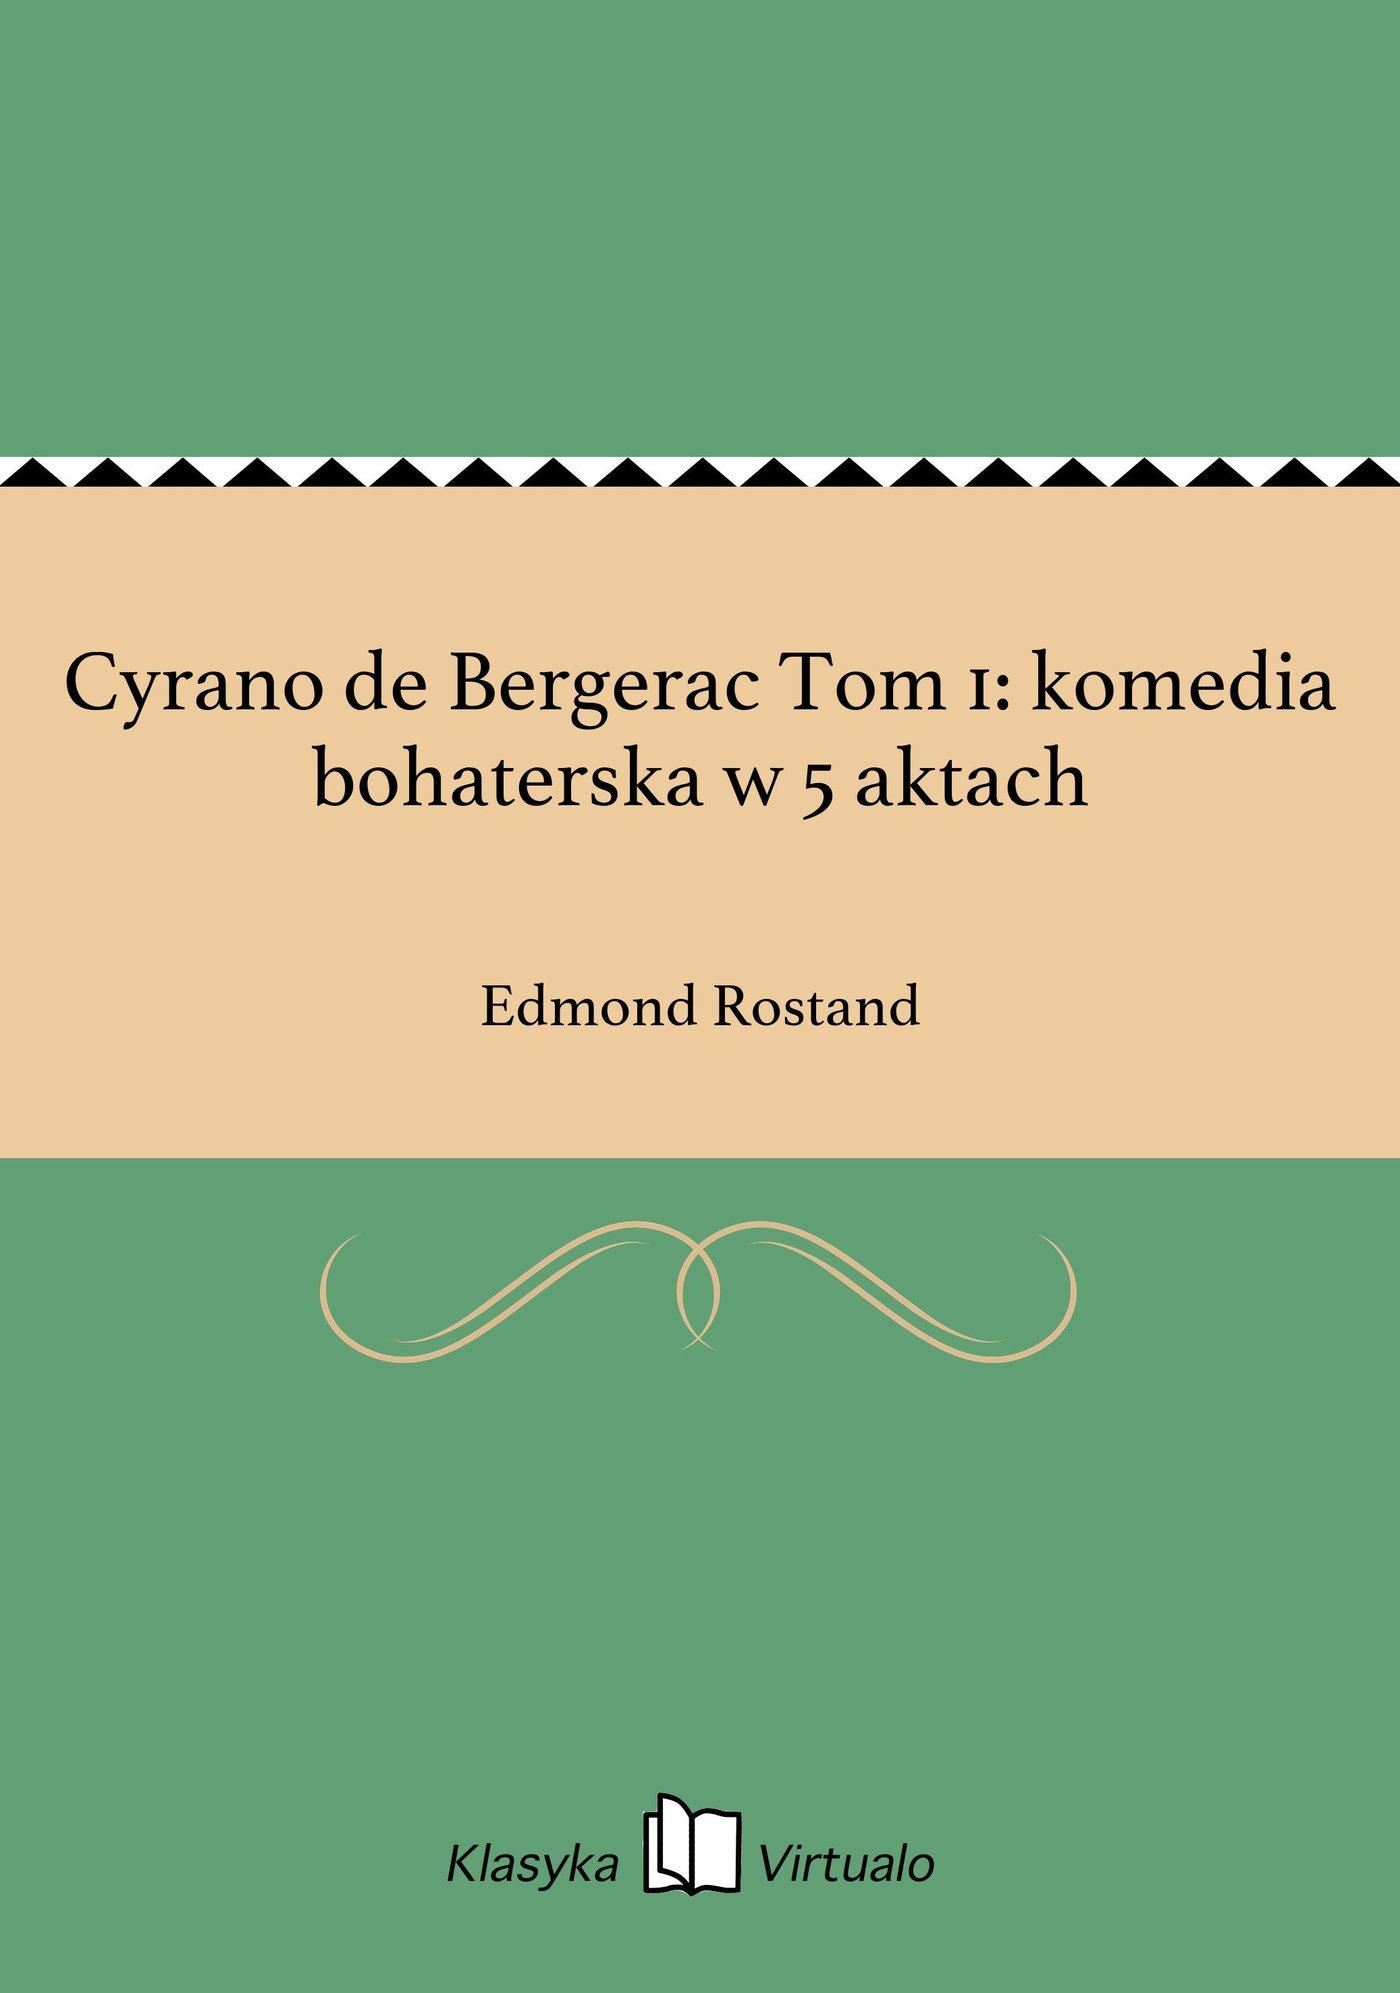 Cyrano de Bergerac Tom 1: komedia bohaterska w 5 aktach - Ebook (Książka EPUB) do pobrania w formacie EPUB